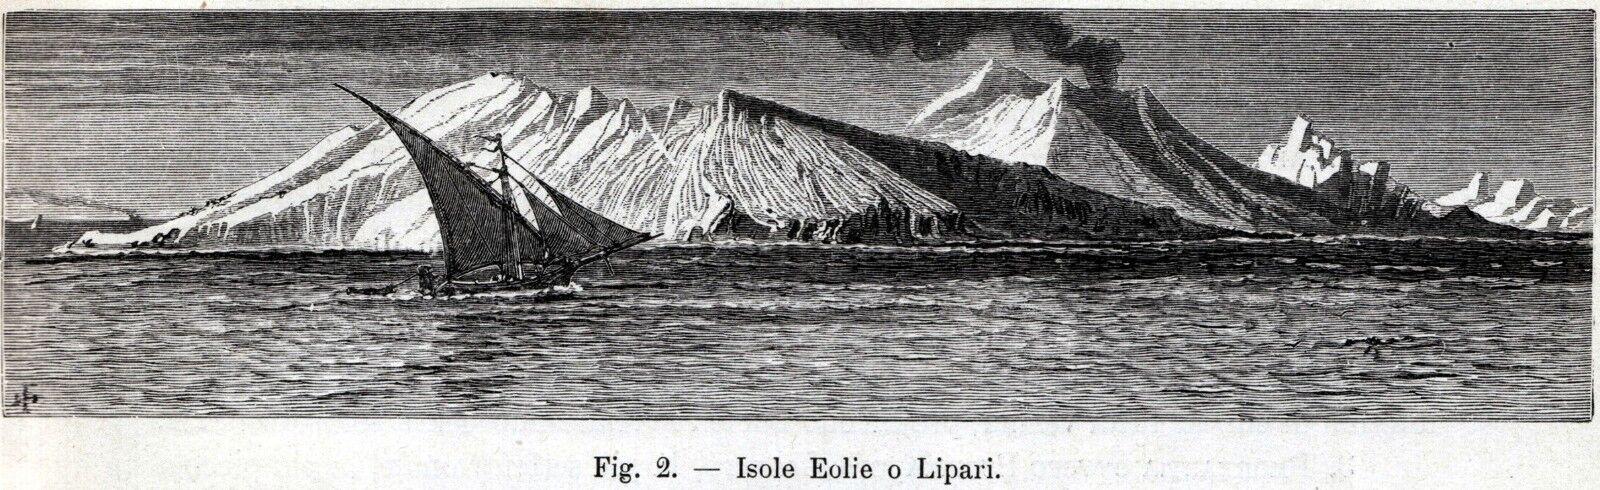 Sicilia Isole Eolie o Lipari Aeolian Islands Stampa Antica Passepartout.1893